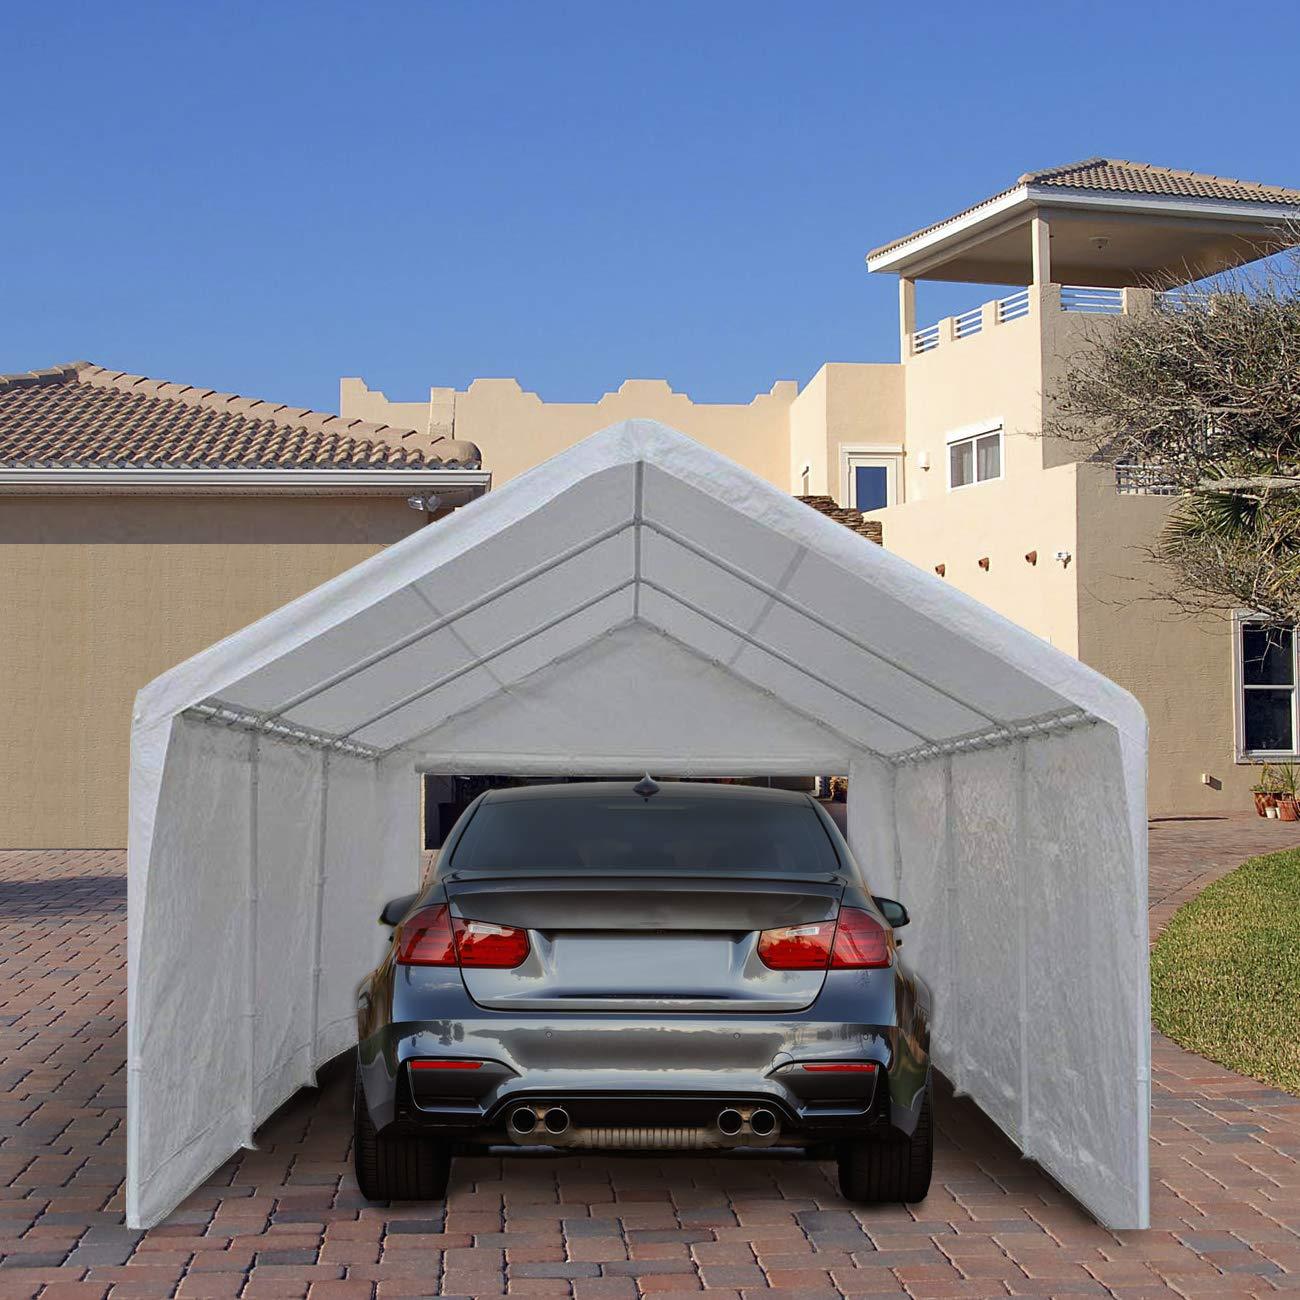 Abba Patio 12 x 20-Feet Heavy Duty Carport, Car Canopy ...